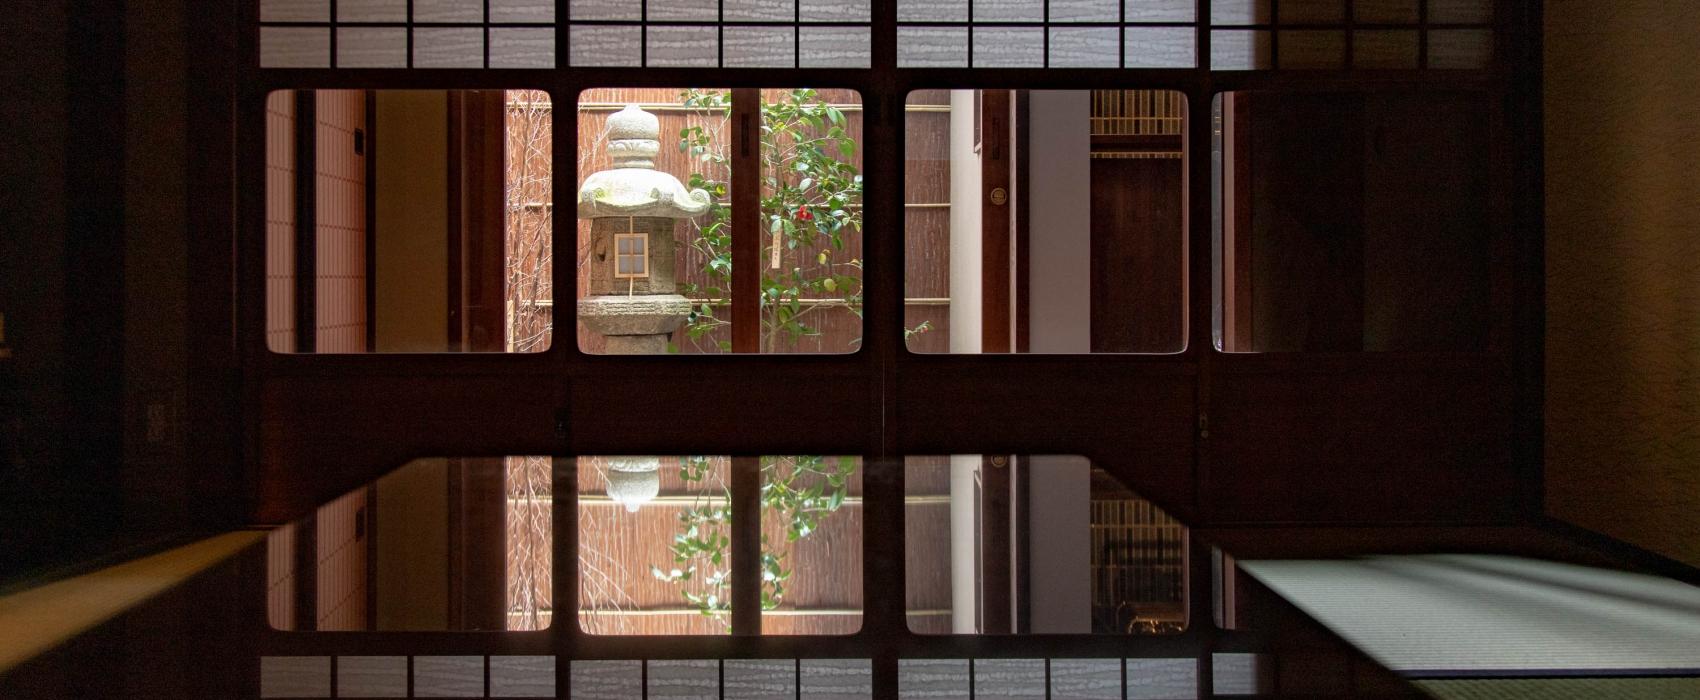 OHARA-JUKU photo Asie